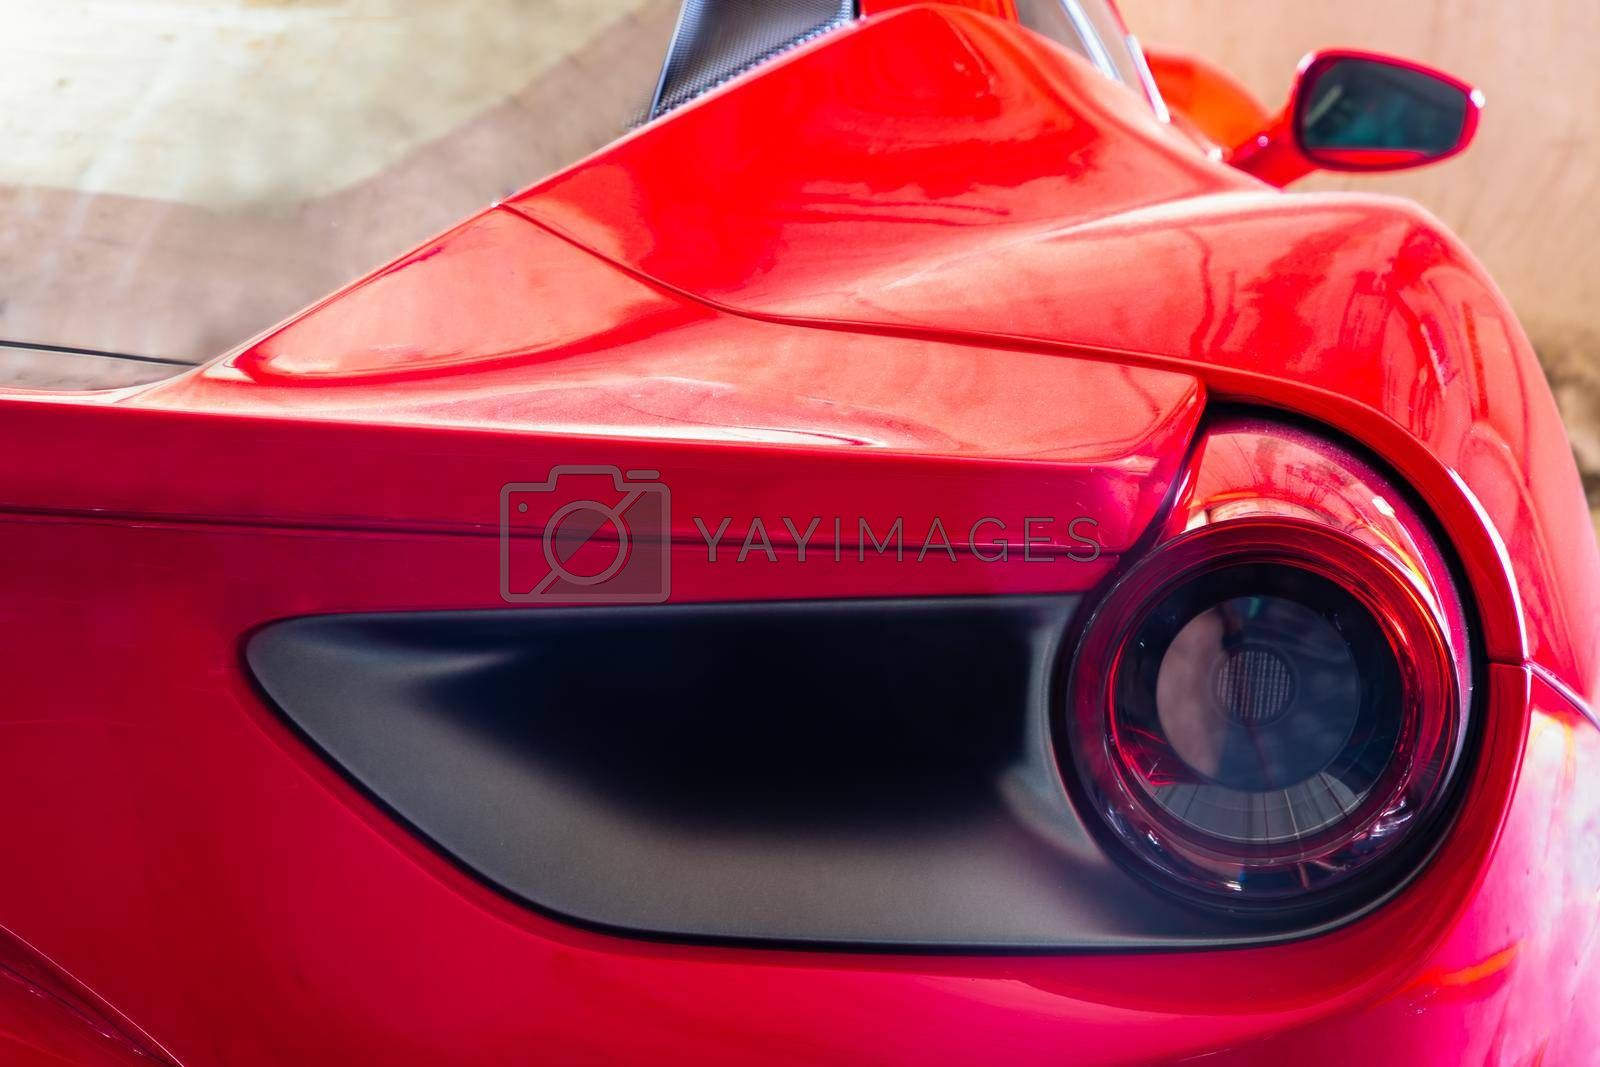 Bangkok, Thailand - 06 Jun 2021 : Close-up of Rear light or Tail lamp and Side view mirror of Red ferrari car. Ferrari is Italian sports car. Selective focus.